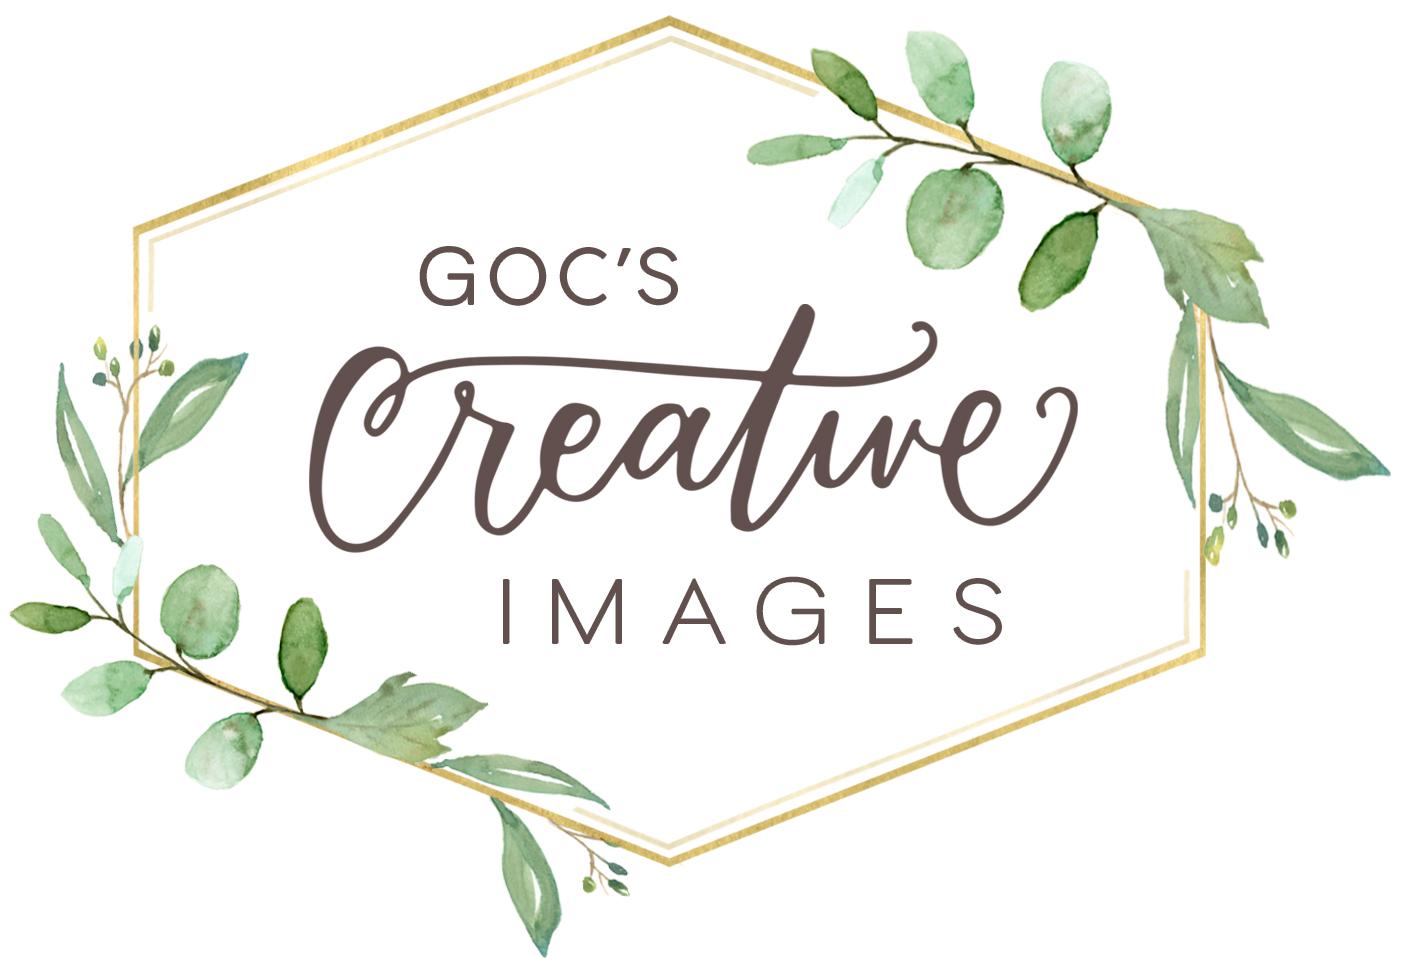 Gocs Creative Images